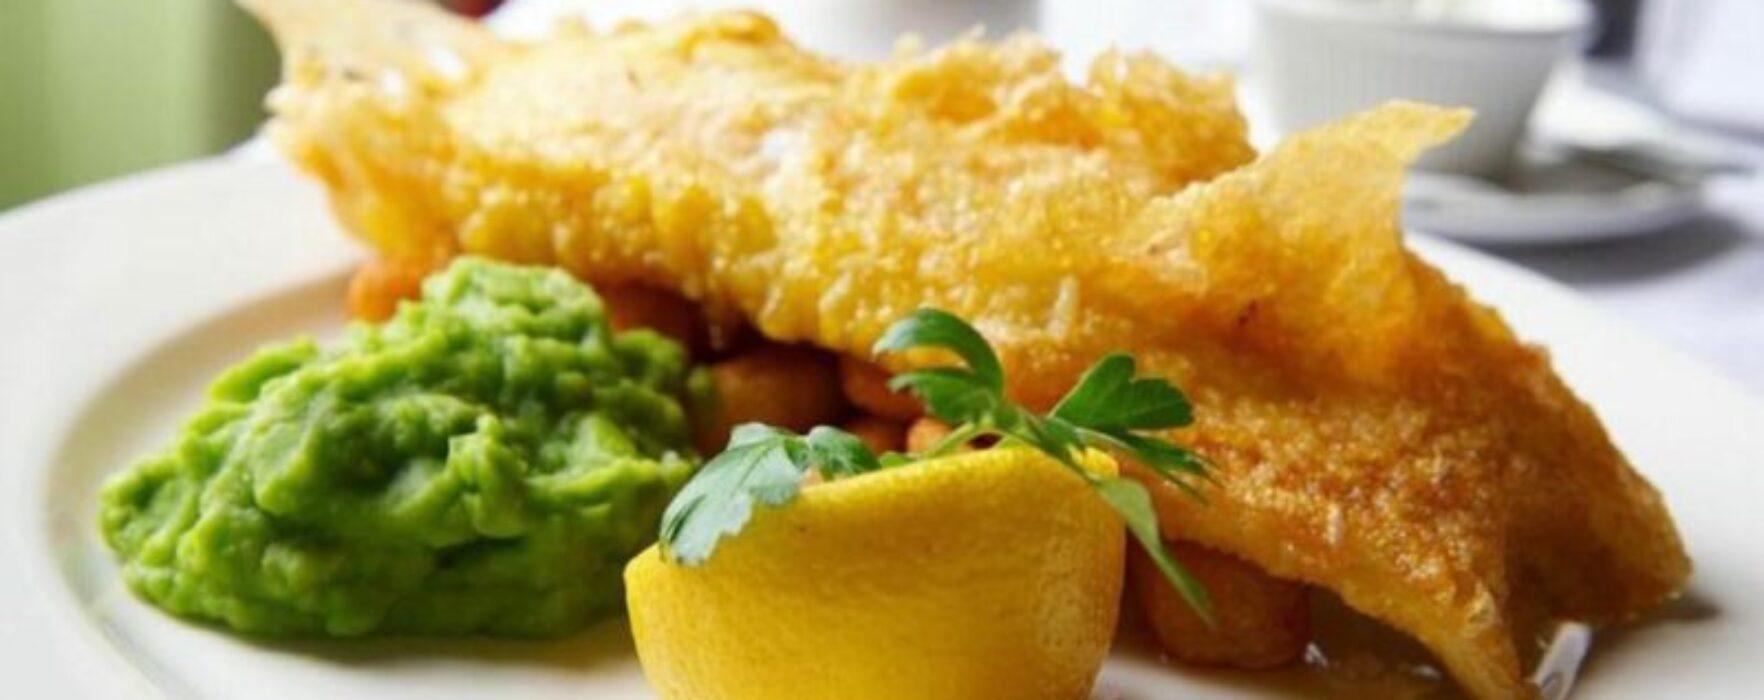 CHESHIRE: Freshly revamped Alderley Edge pub brings back traditional British pub classics with a revolutionary new menu